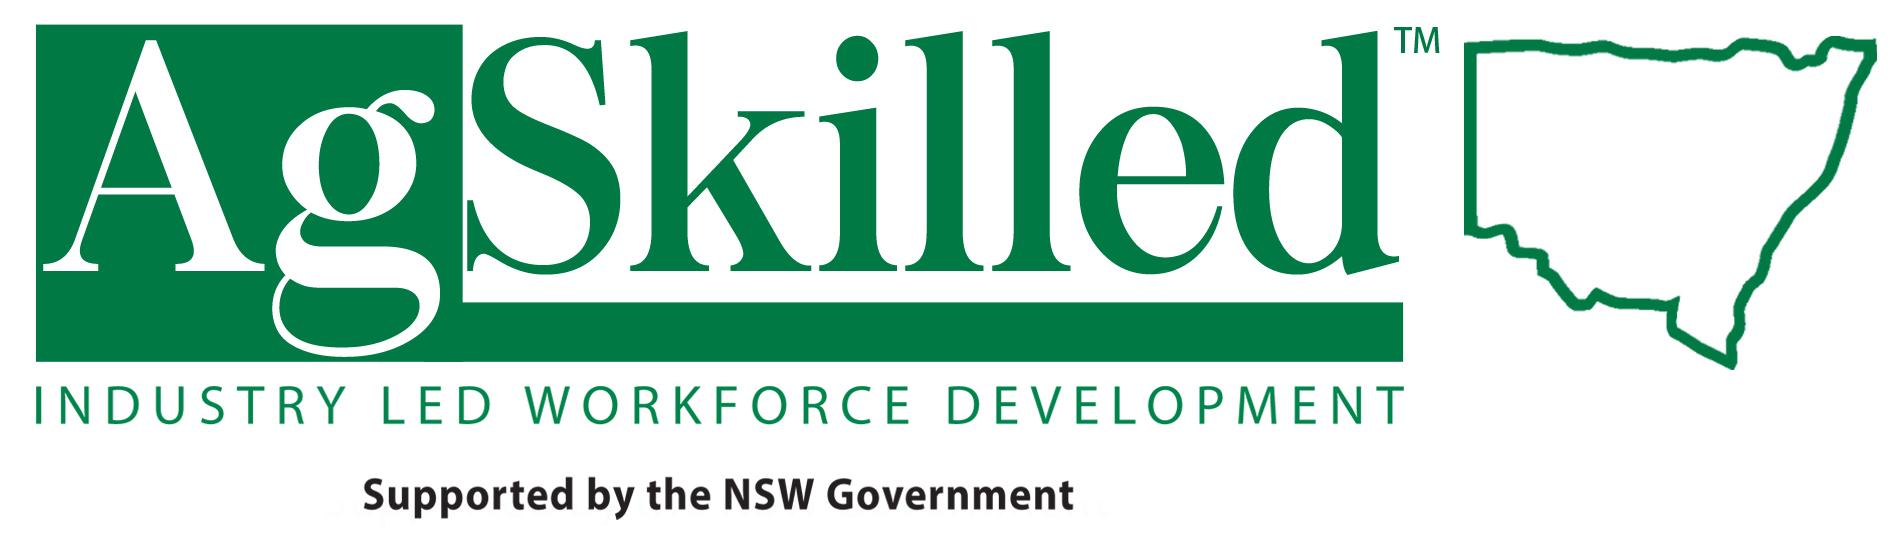 AgSkilled logo